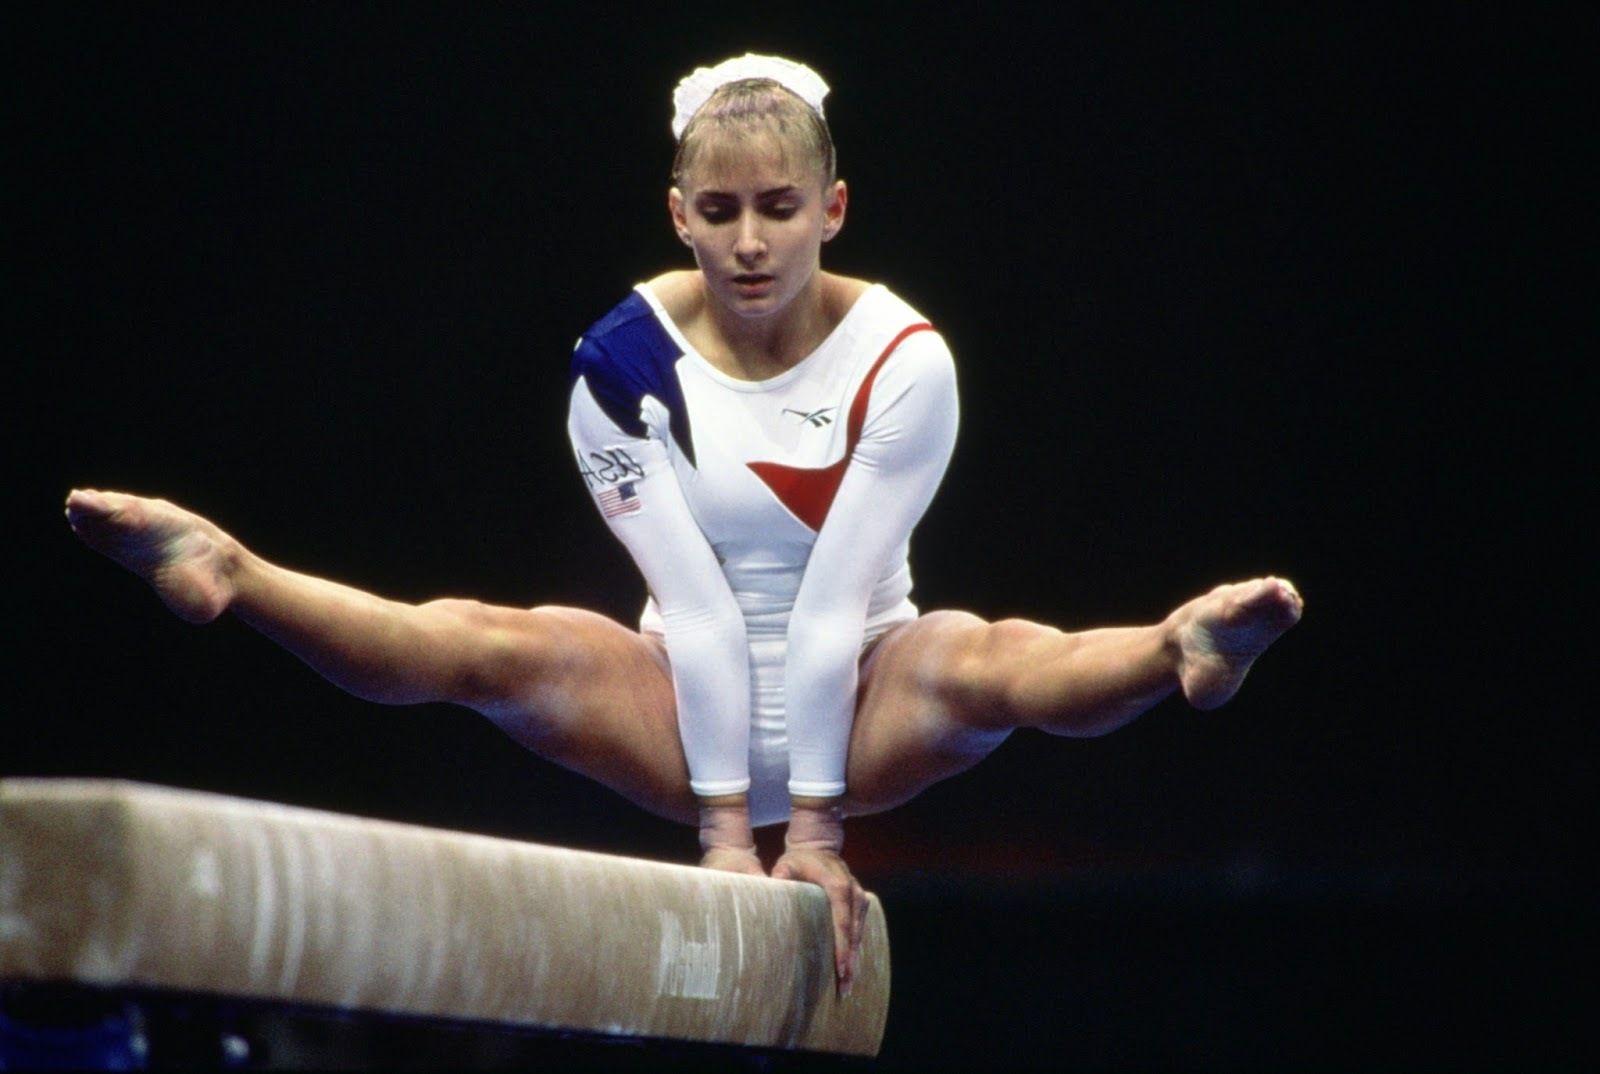 prada shoes men s ukrainian gymnastic team in olympics what cou